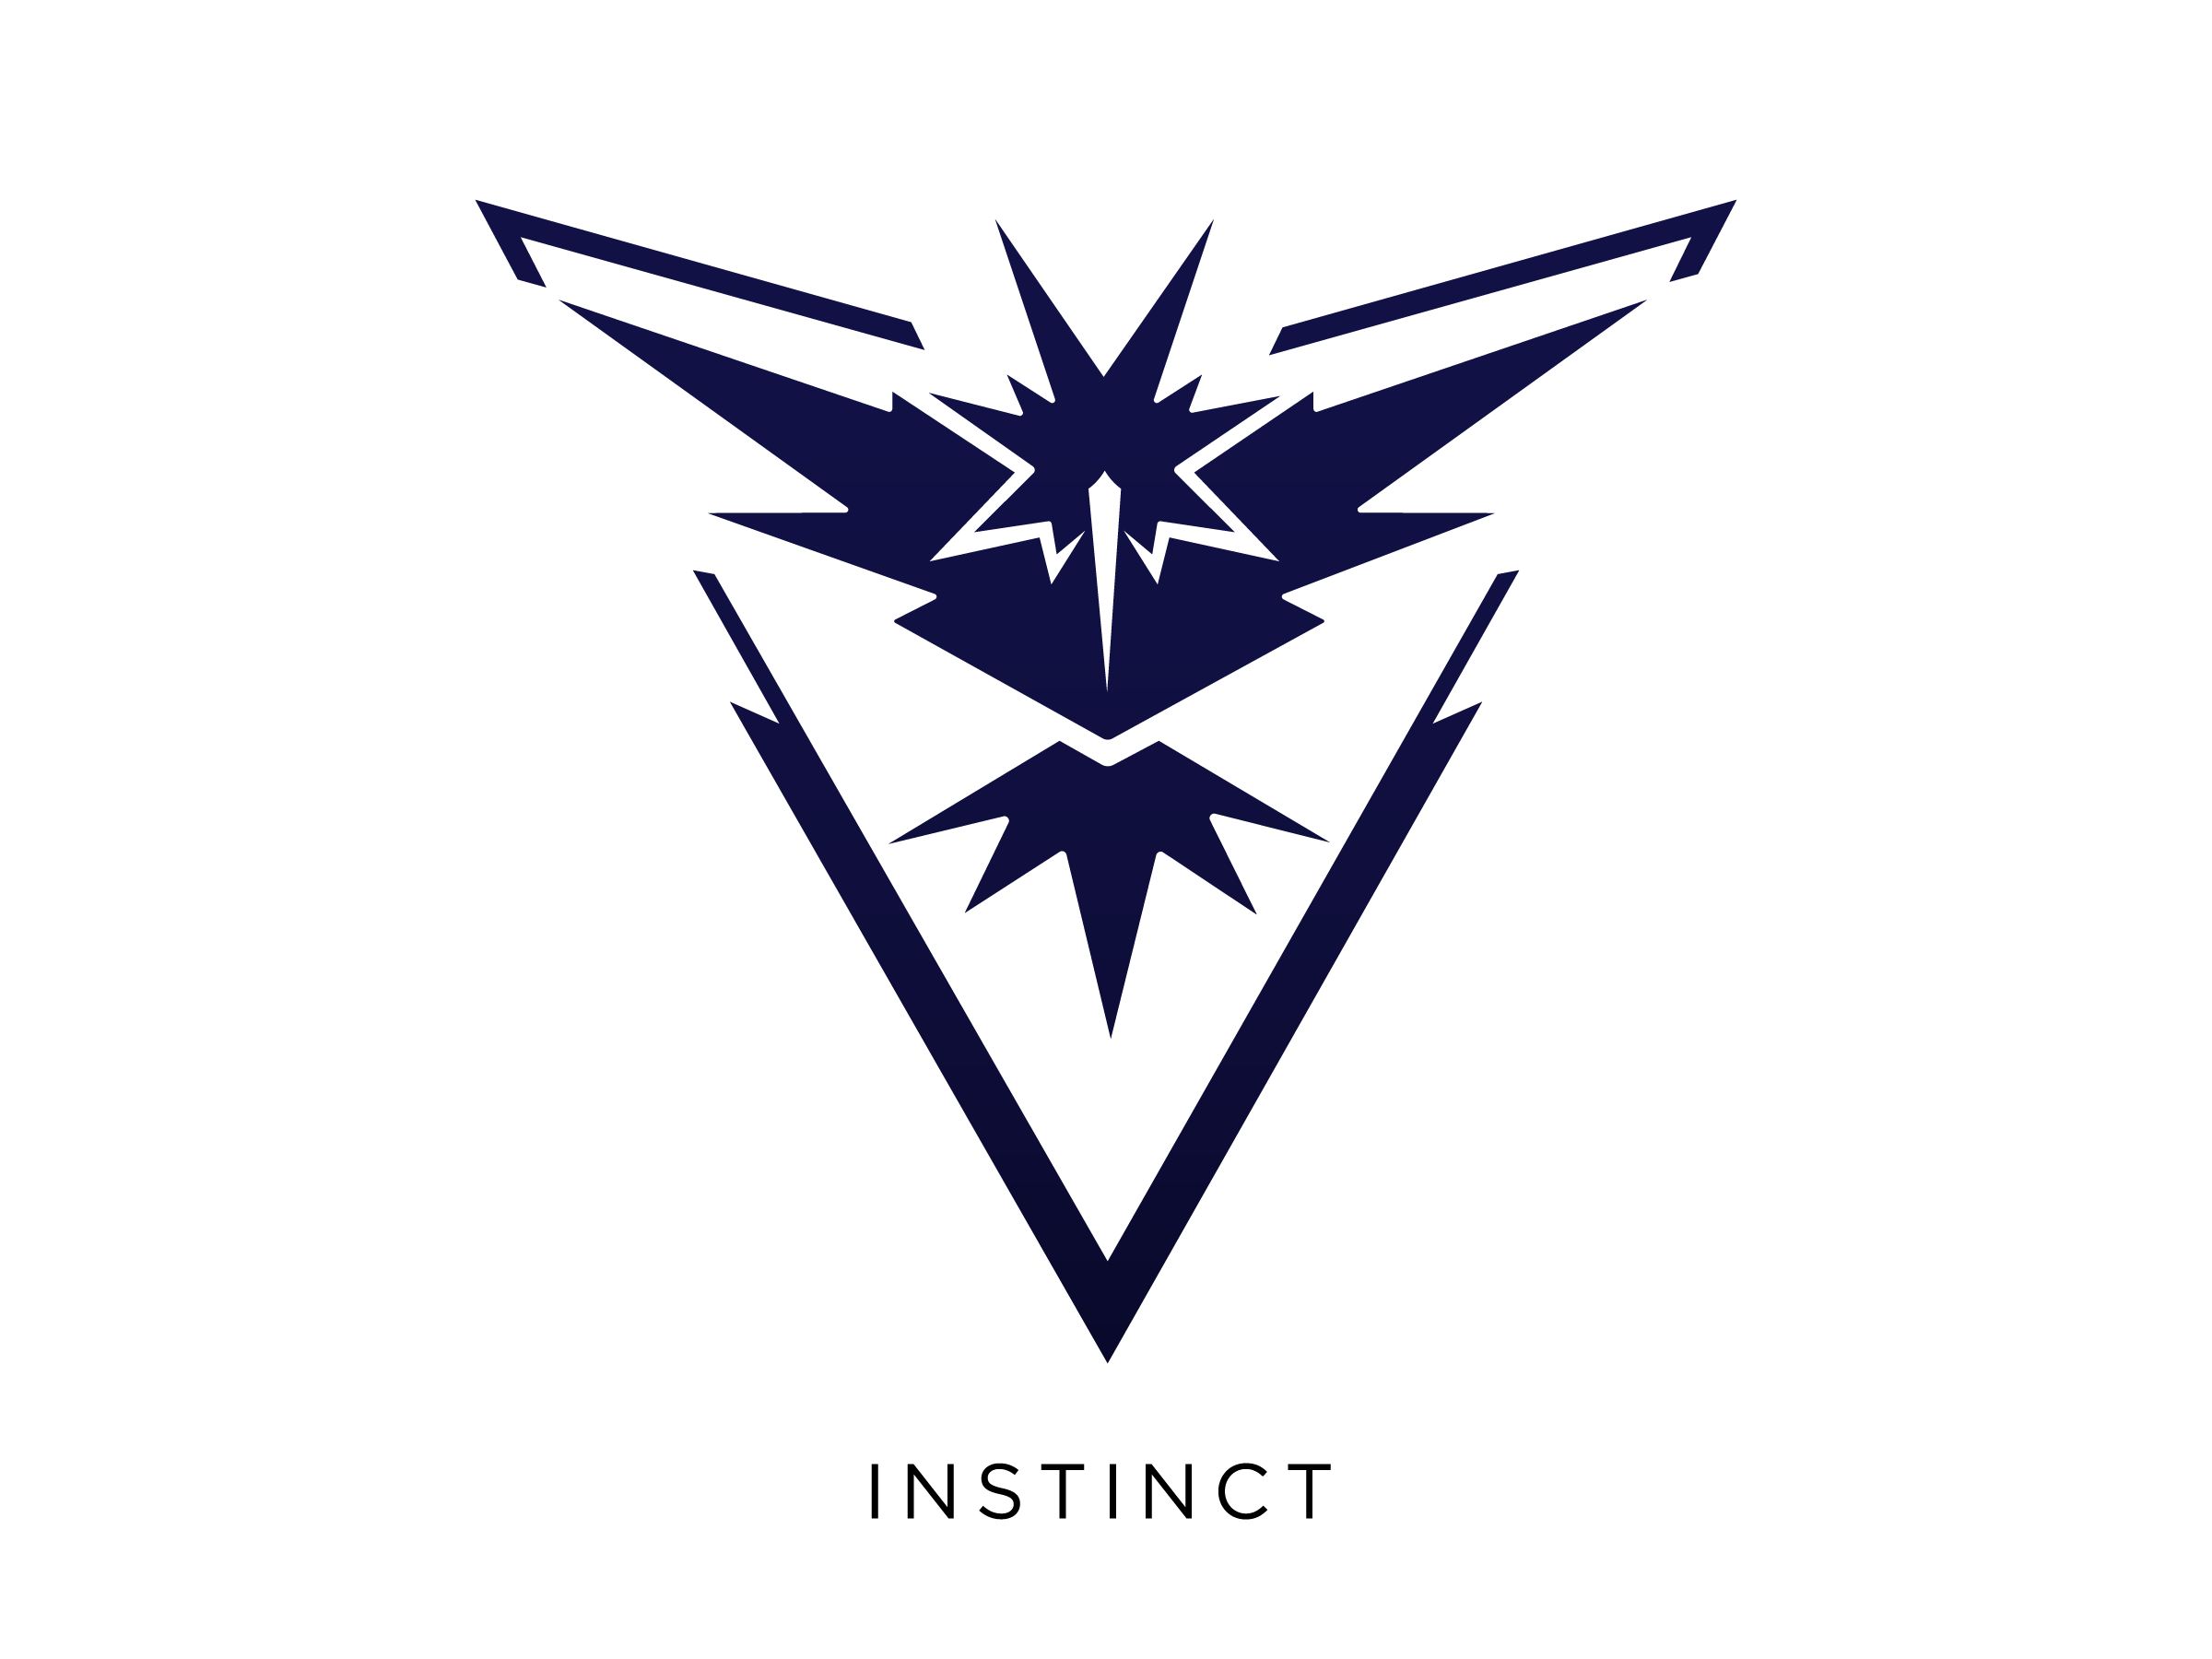 Pokemongo team logos instinct PlusPng.com  - Pokemon Company Logo Vector PNG